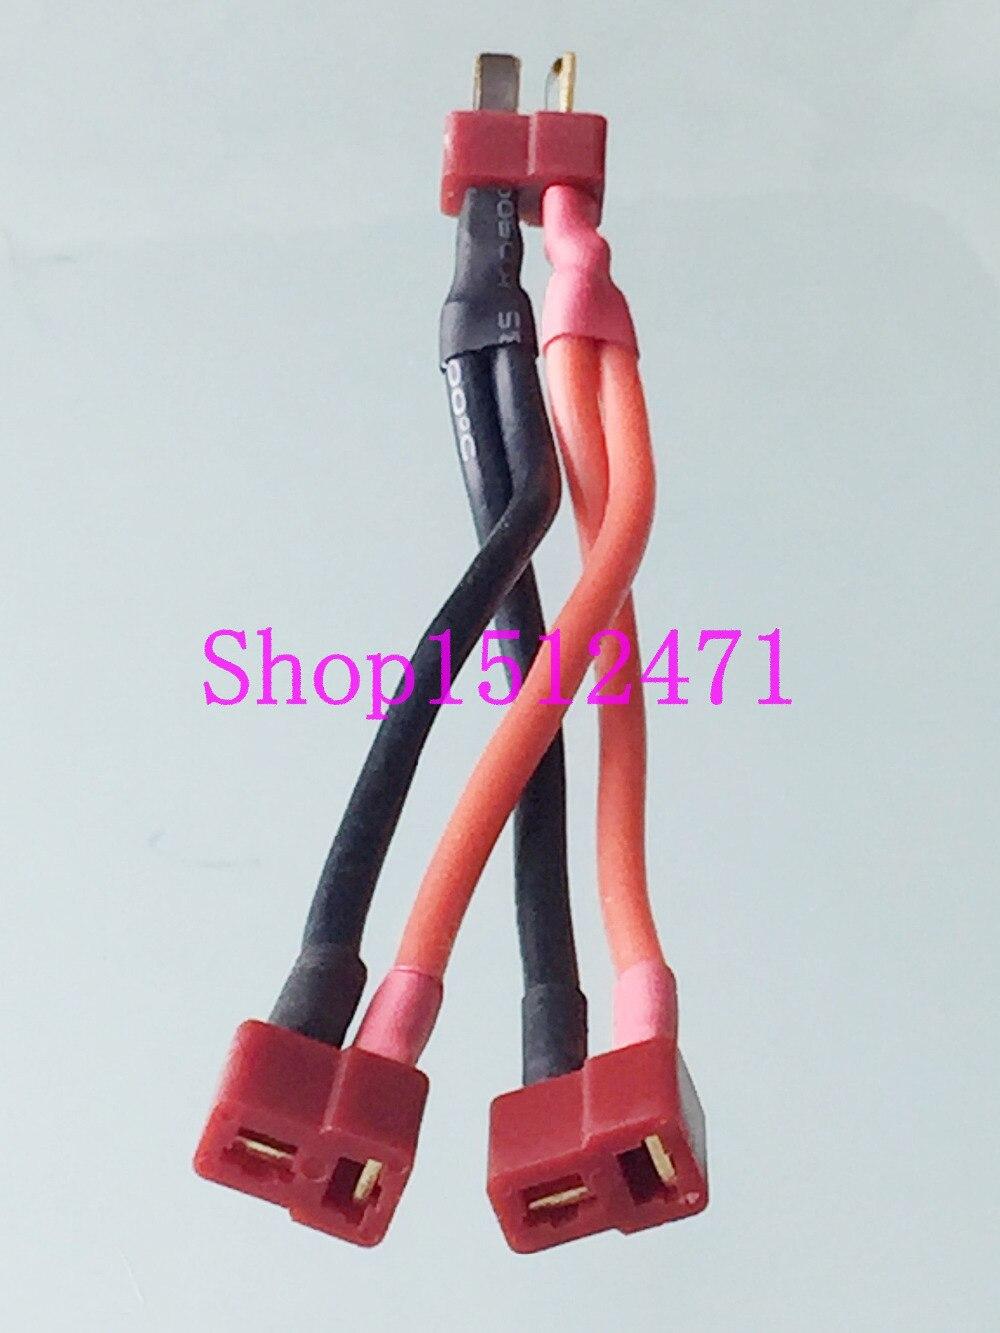 Estilo Deans t-plug paralelo Y arnés 1 enchufe a 2 jack cable para batería Lipo RC